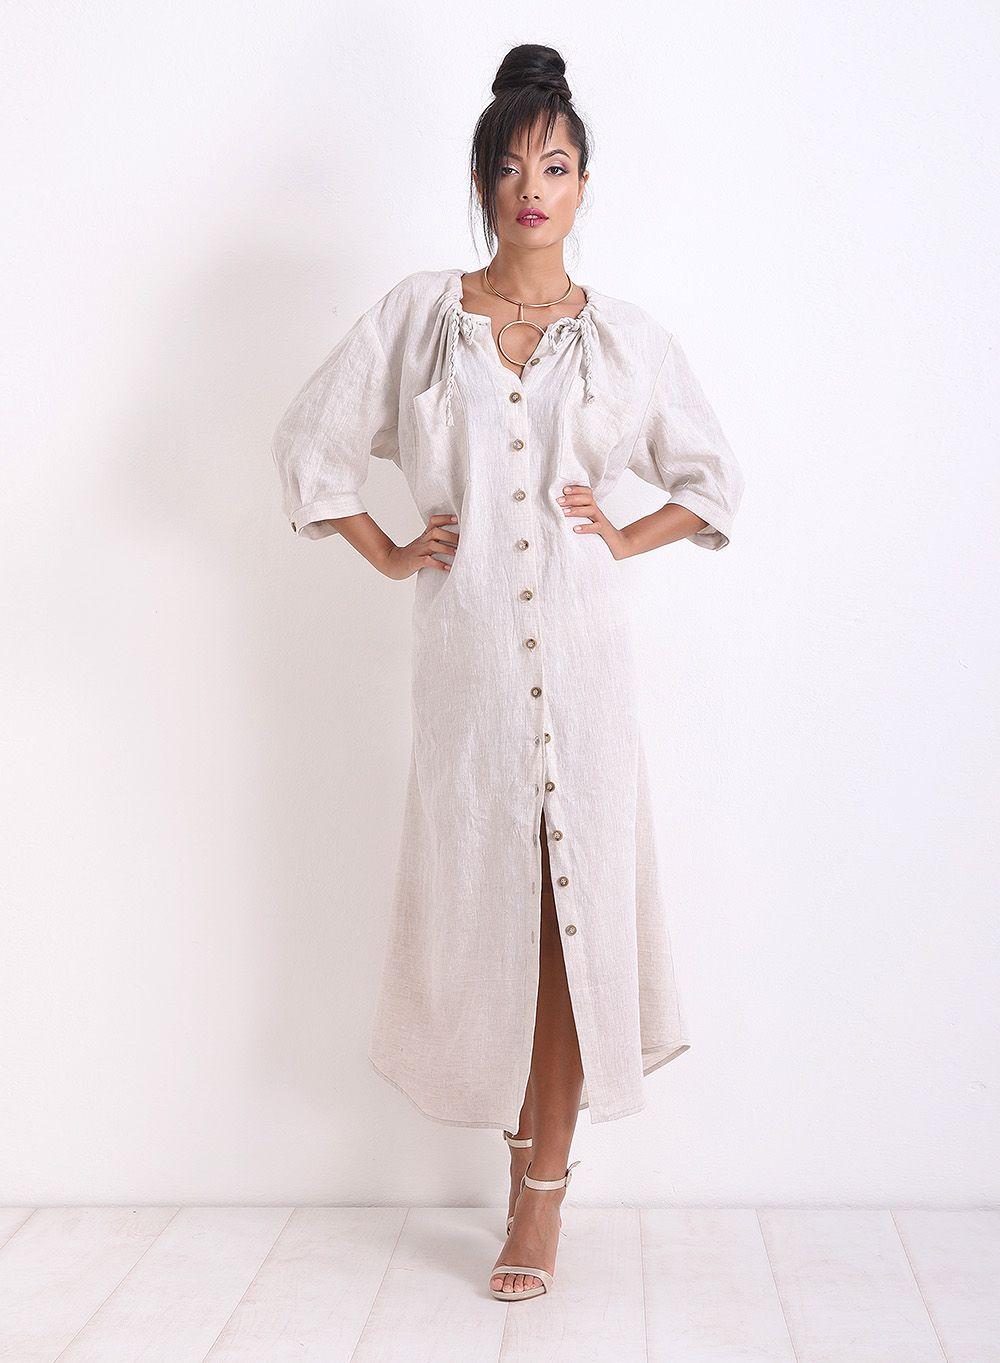 Linen dress long dress beige dress plus size dress casual dress